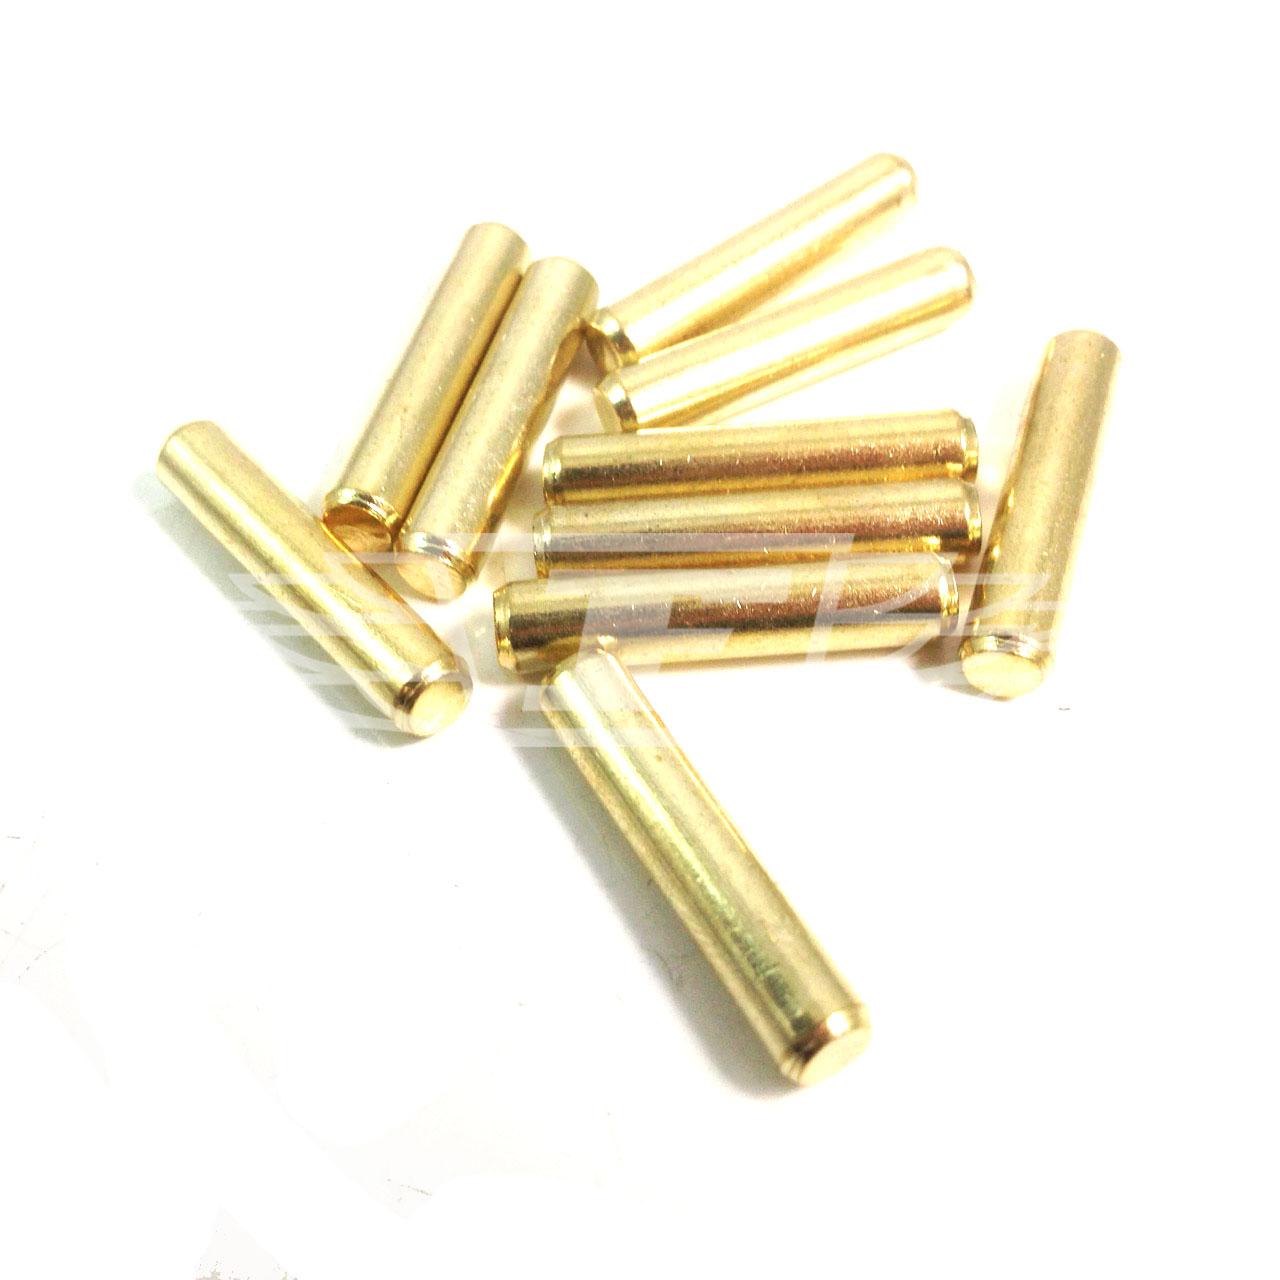 BRASS PIN 5mm SHELF SUPPORT STUD PEGS, KITCHEN CABINETS